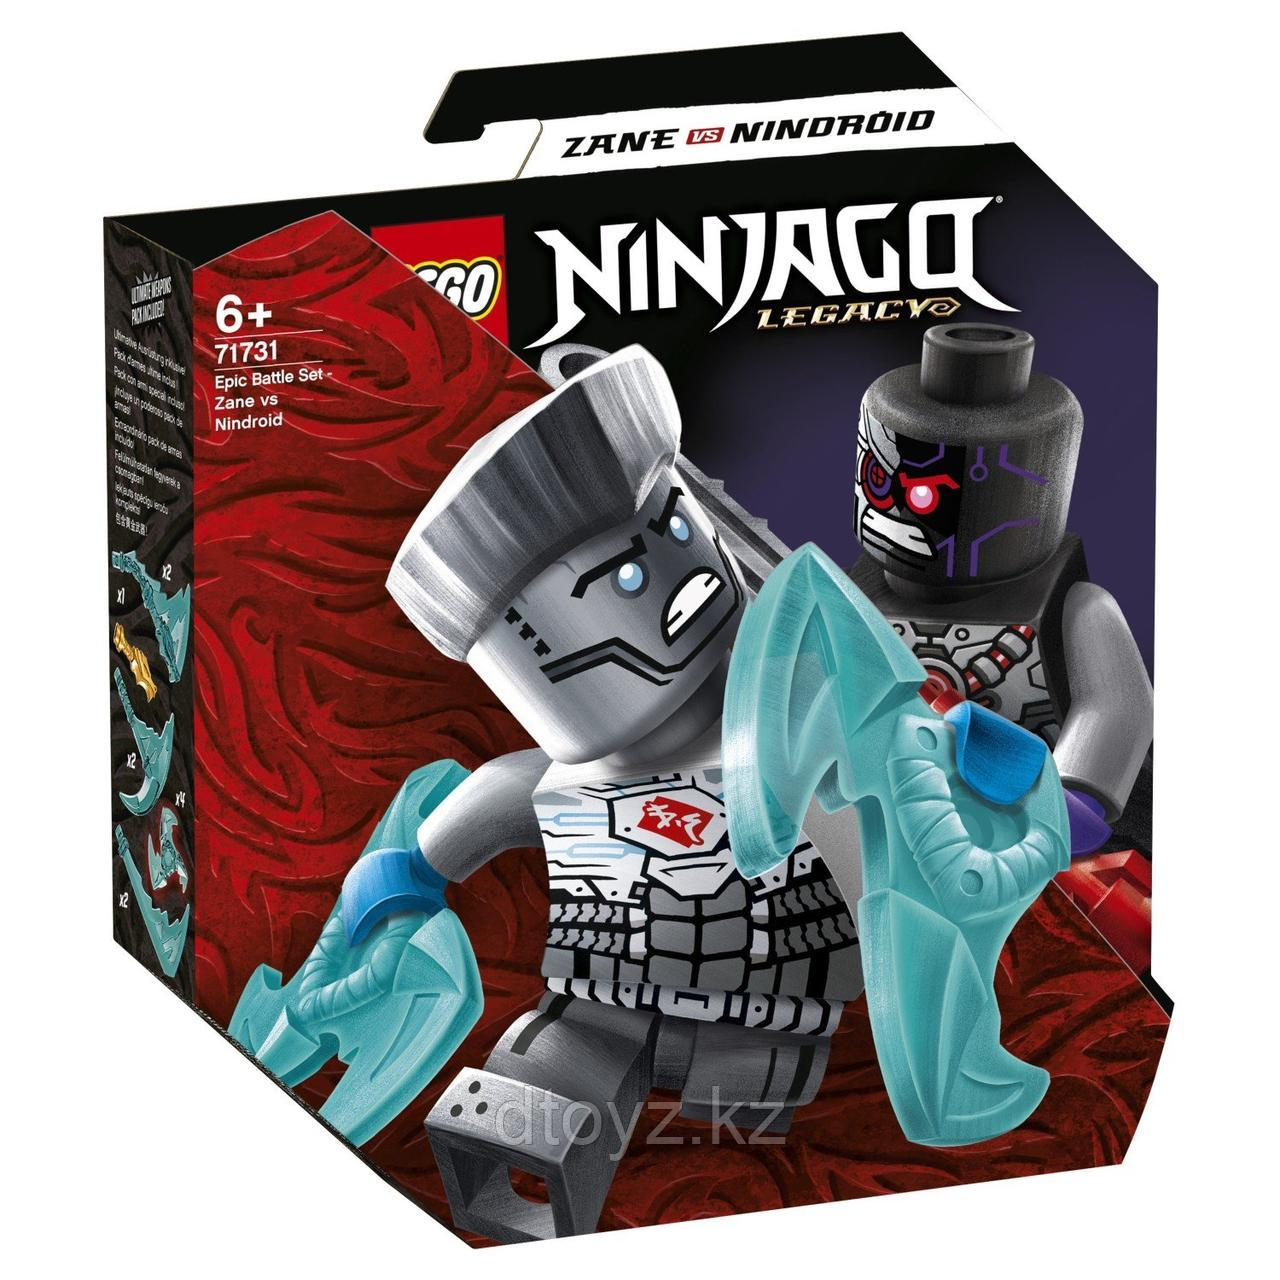 Lego Ninjago Легендарные битвы: Зейн против Ниндроида 71731